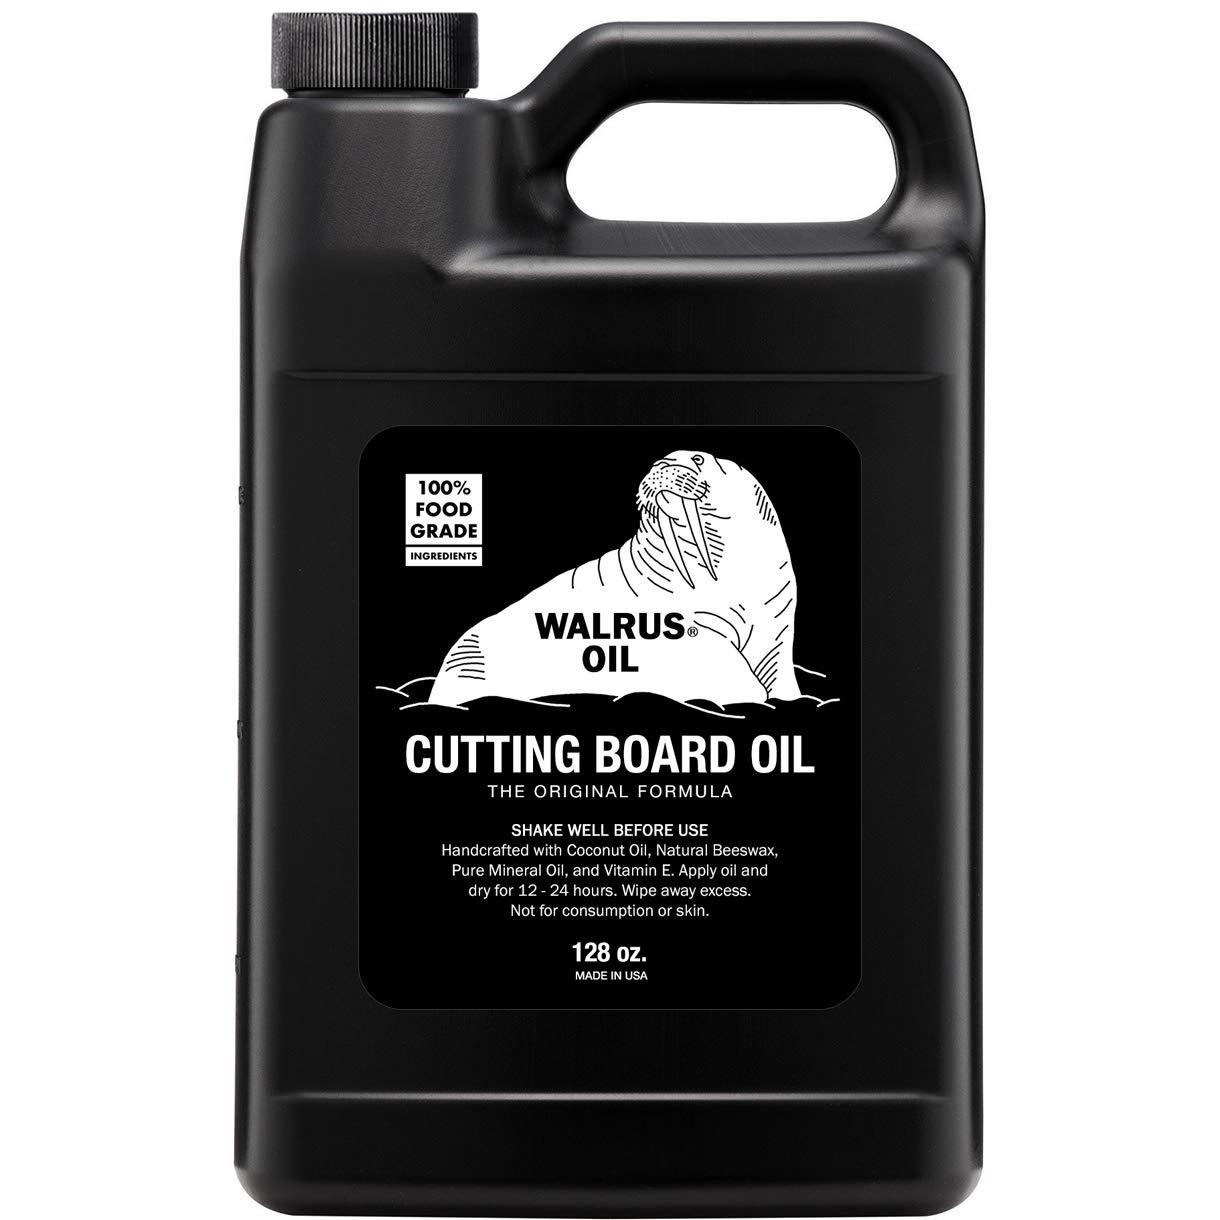 WALRUS OIL - Cutting Board Oil and Wood Butcher Block Oil, 128 oz / 1 gallon Jug by Walrus Oil